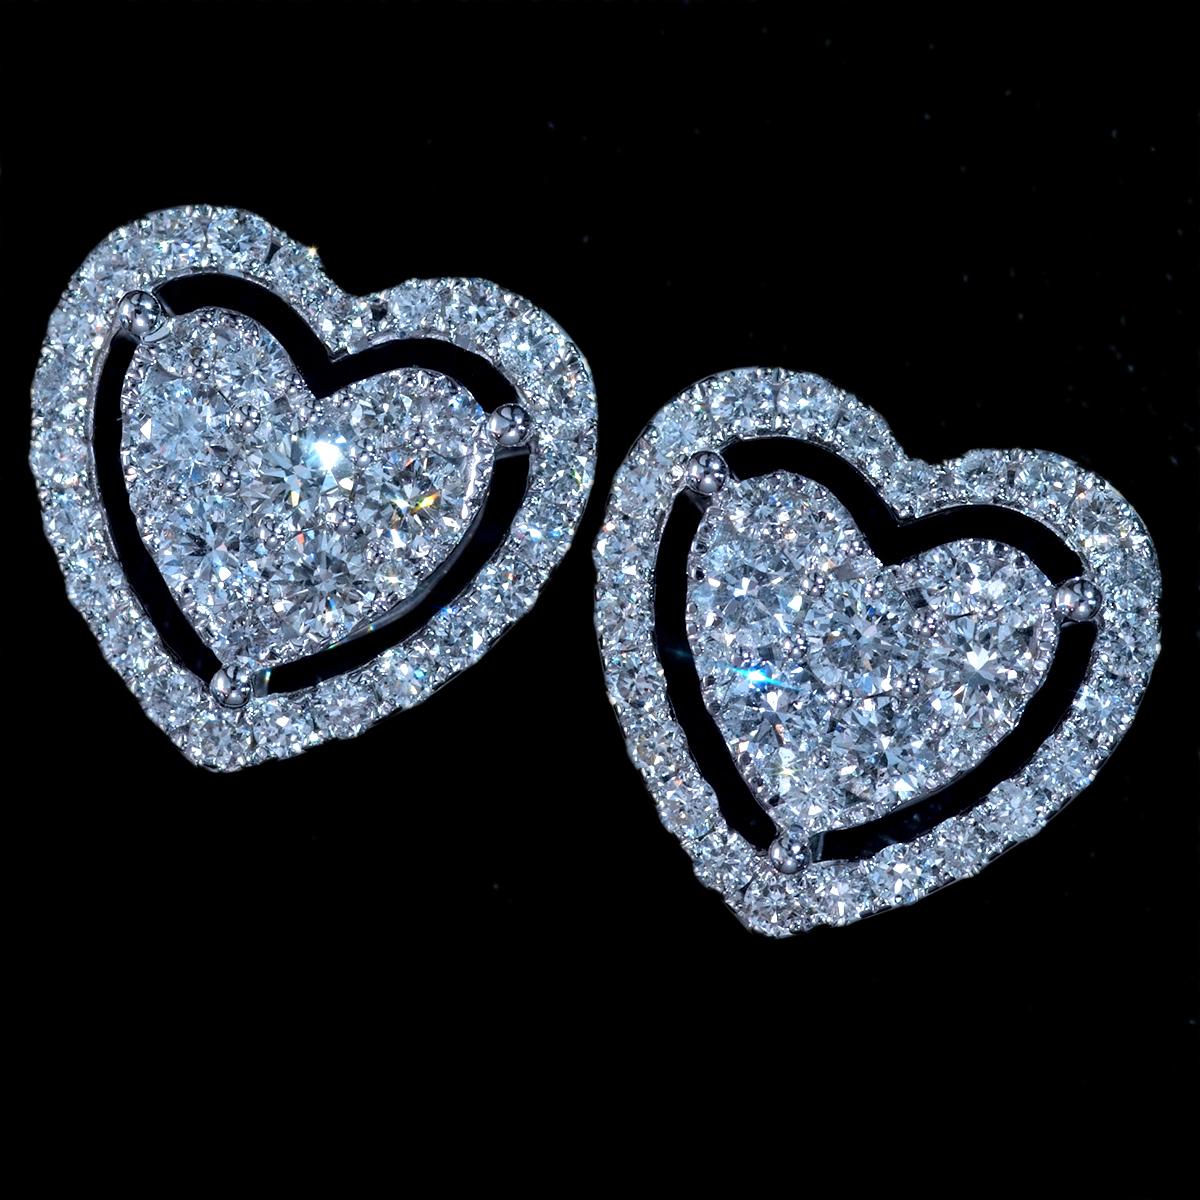 *PE3389【Heart Diamond Earrings】ハートダイヤモンドイヤリングス 天然上質ダイヤモンド1.20ct 最高級18金WG無垢ピアス